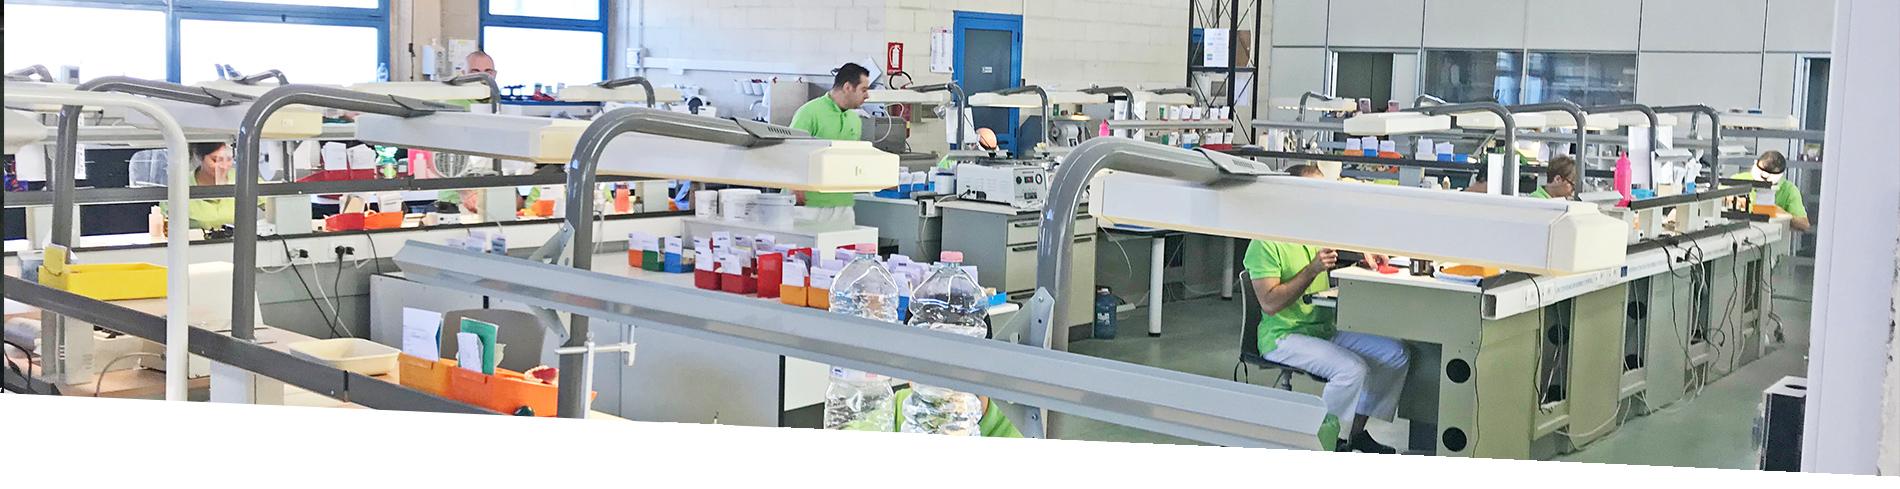 Laboratorio odontotecnico Milano